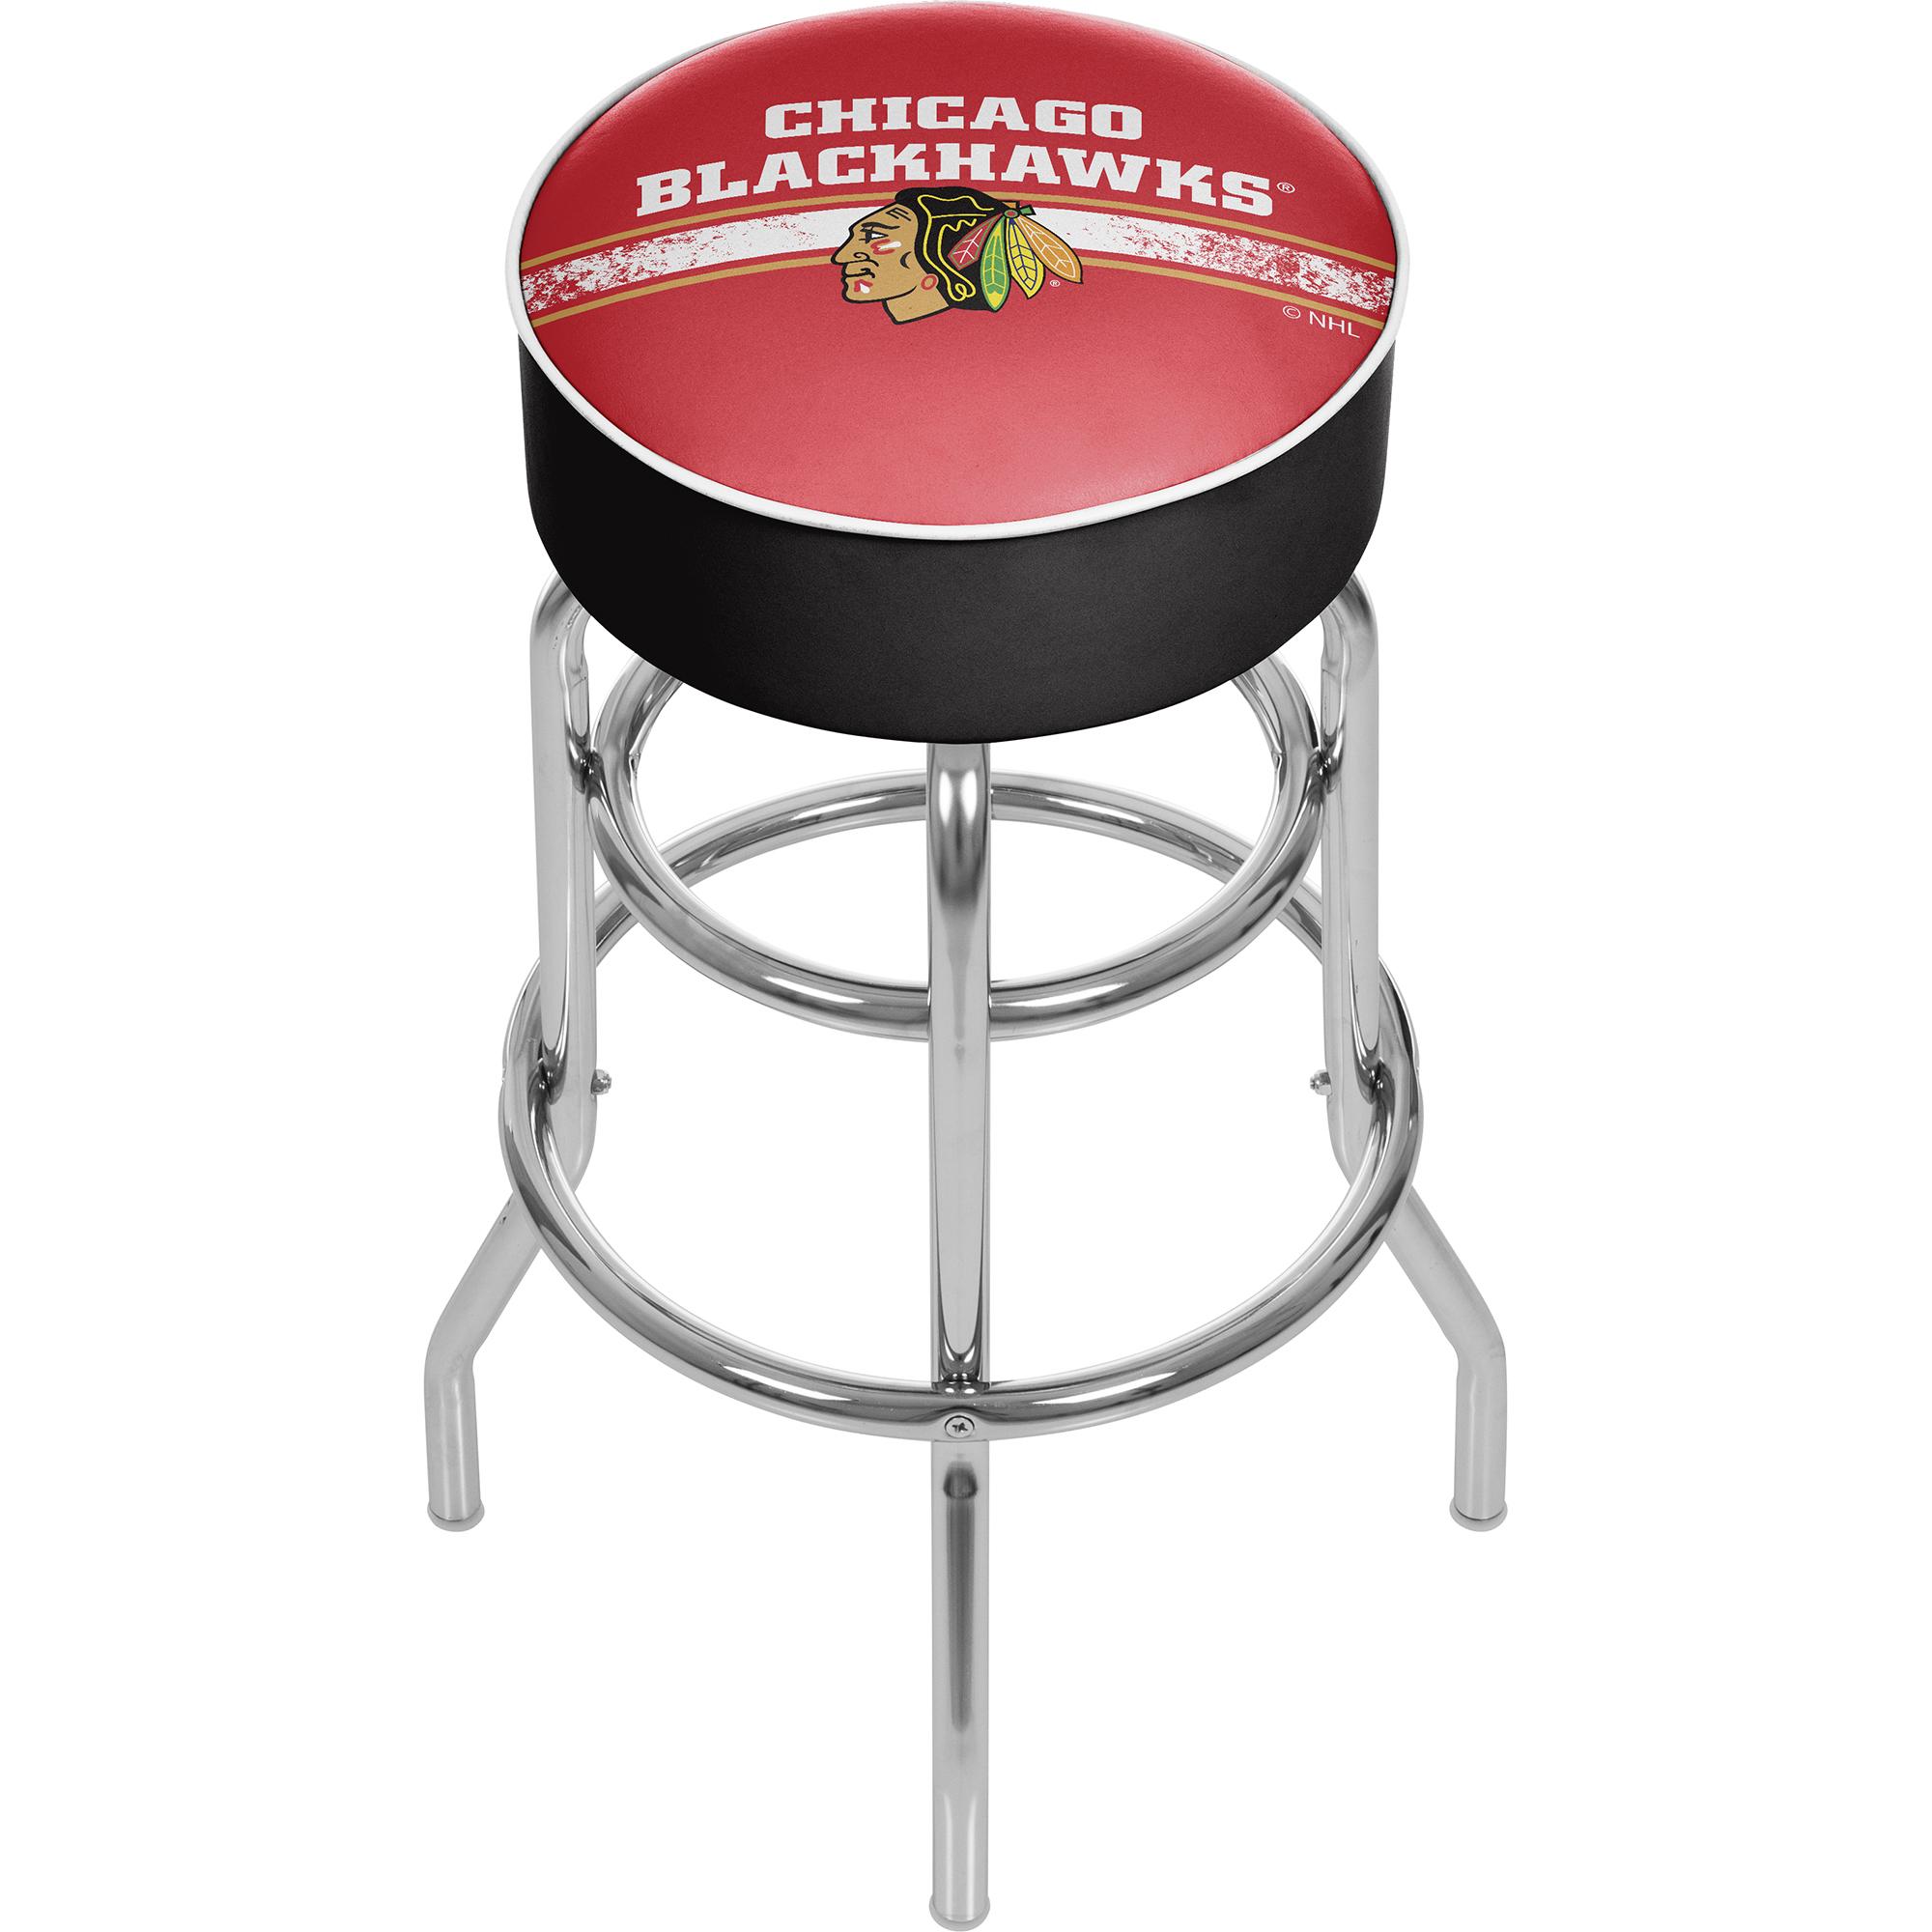 NHL Chrome Bar Stool with Swivel - Chicago Blackhawks 589b8bebc98fc43a0468a500